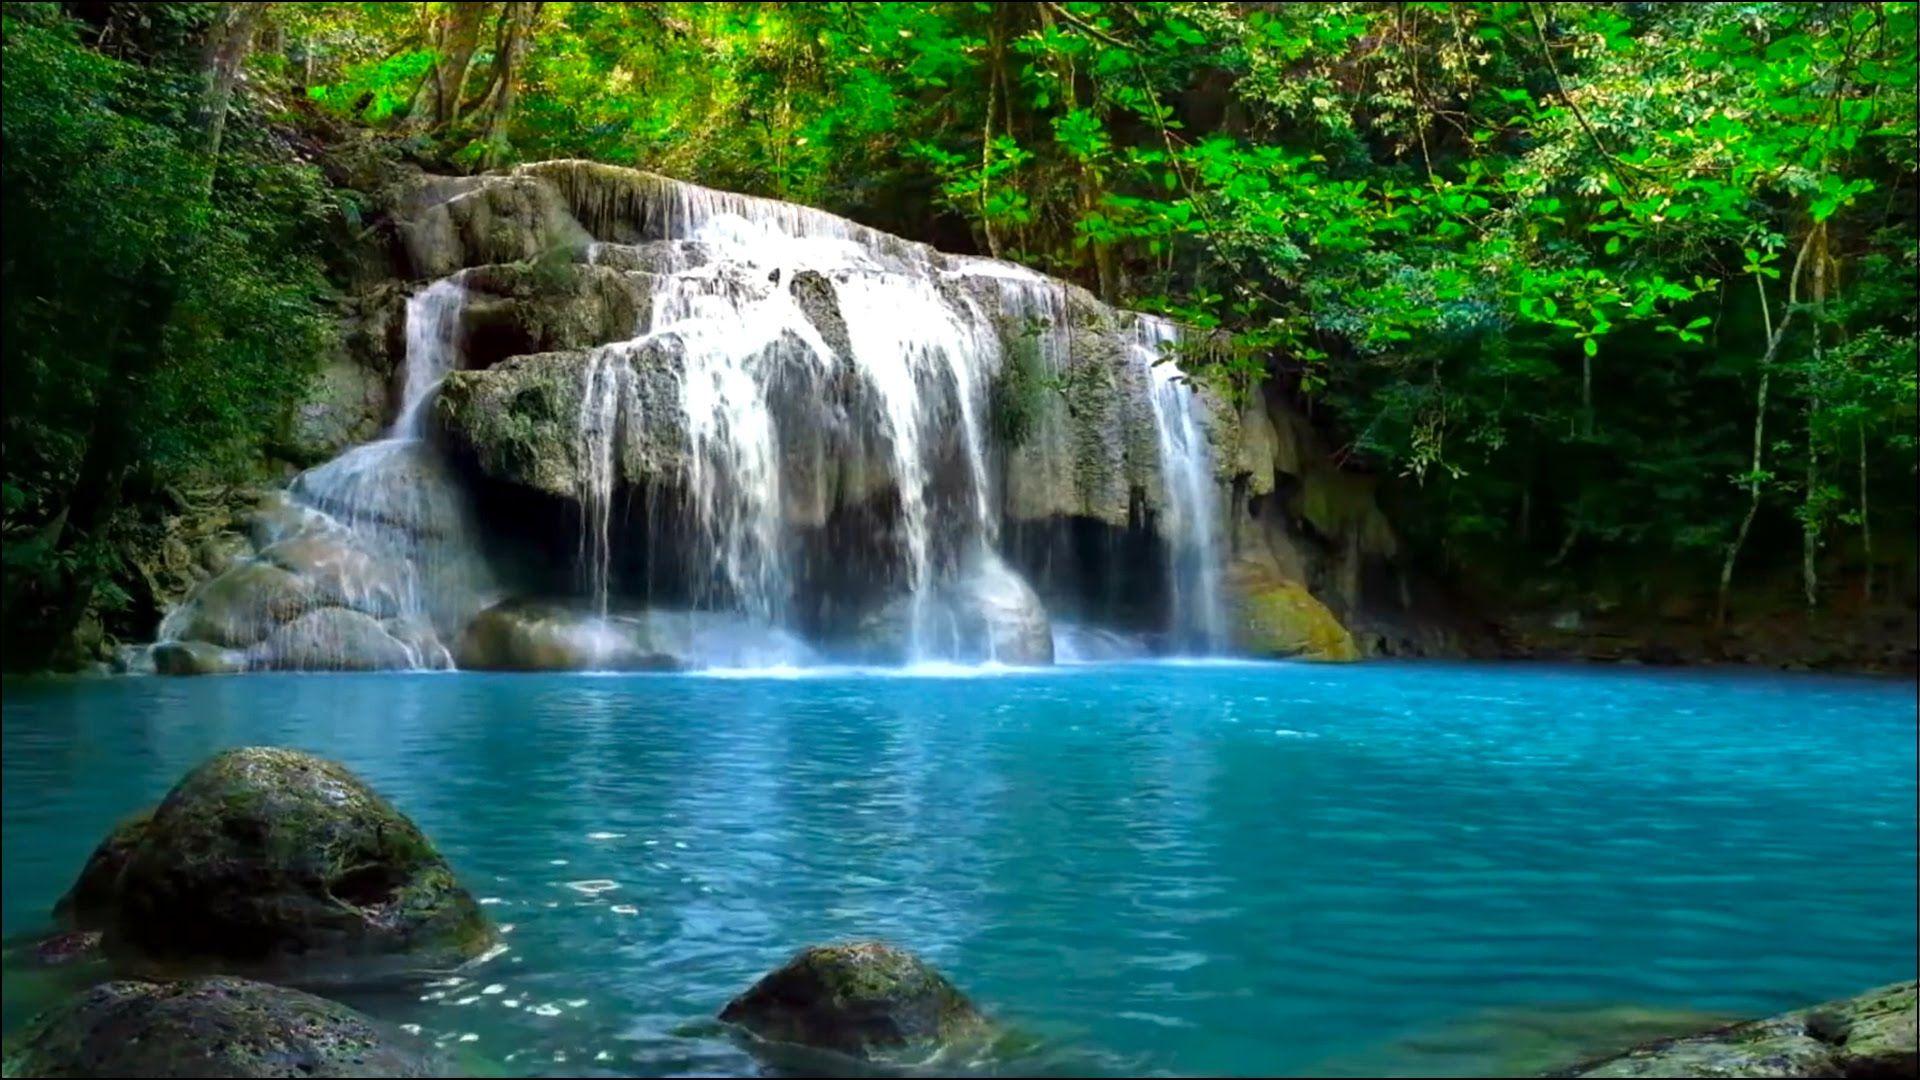 Waterfall jungle sounds relaxing tropical rainforest nature waterfall jungle sounds relaxing tropical rainforest nature sound ccuart Image collections